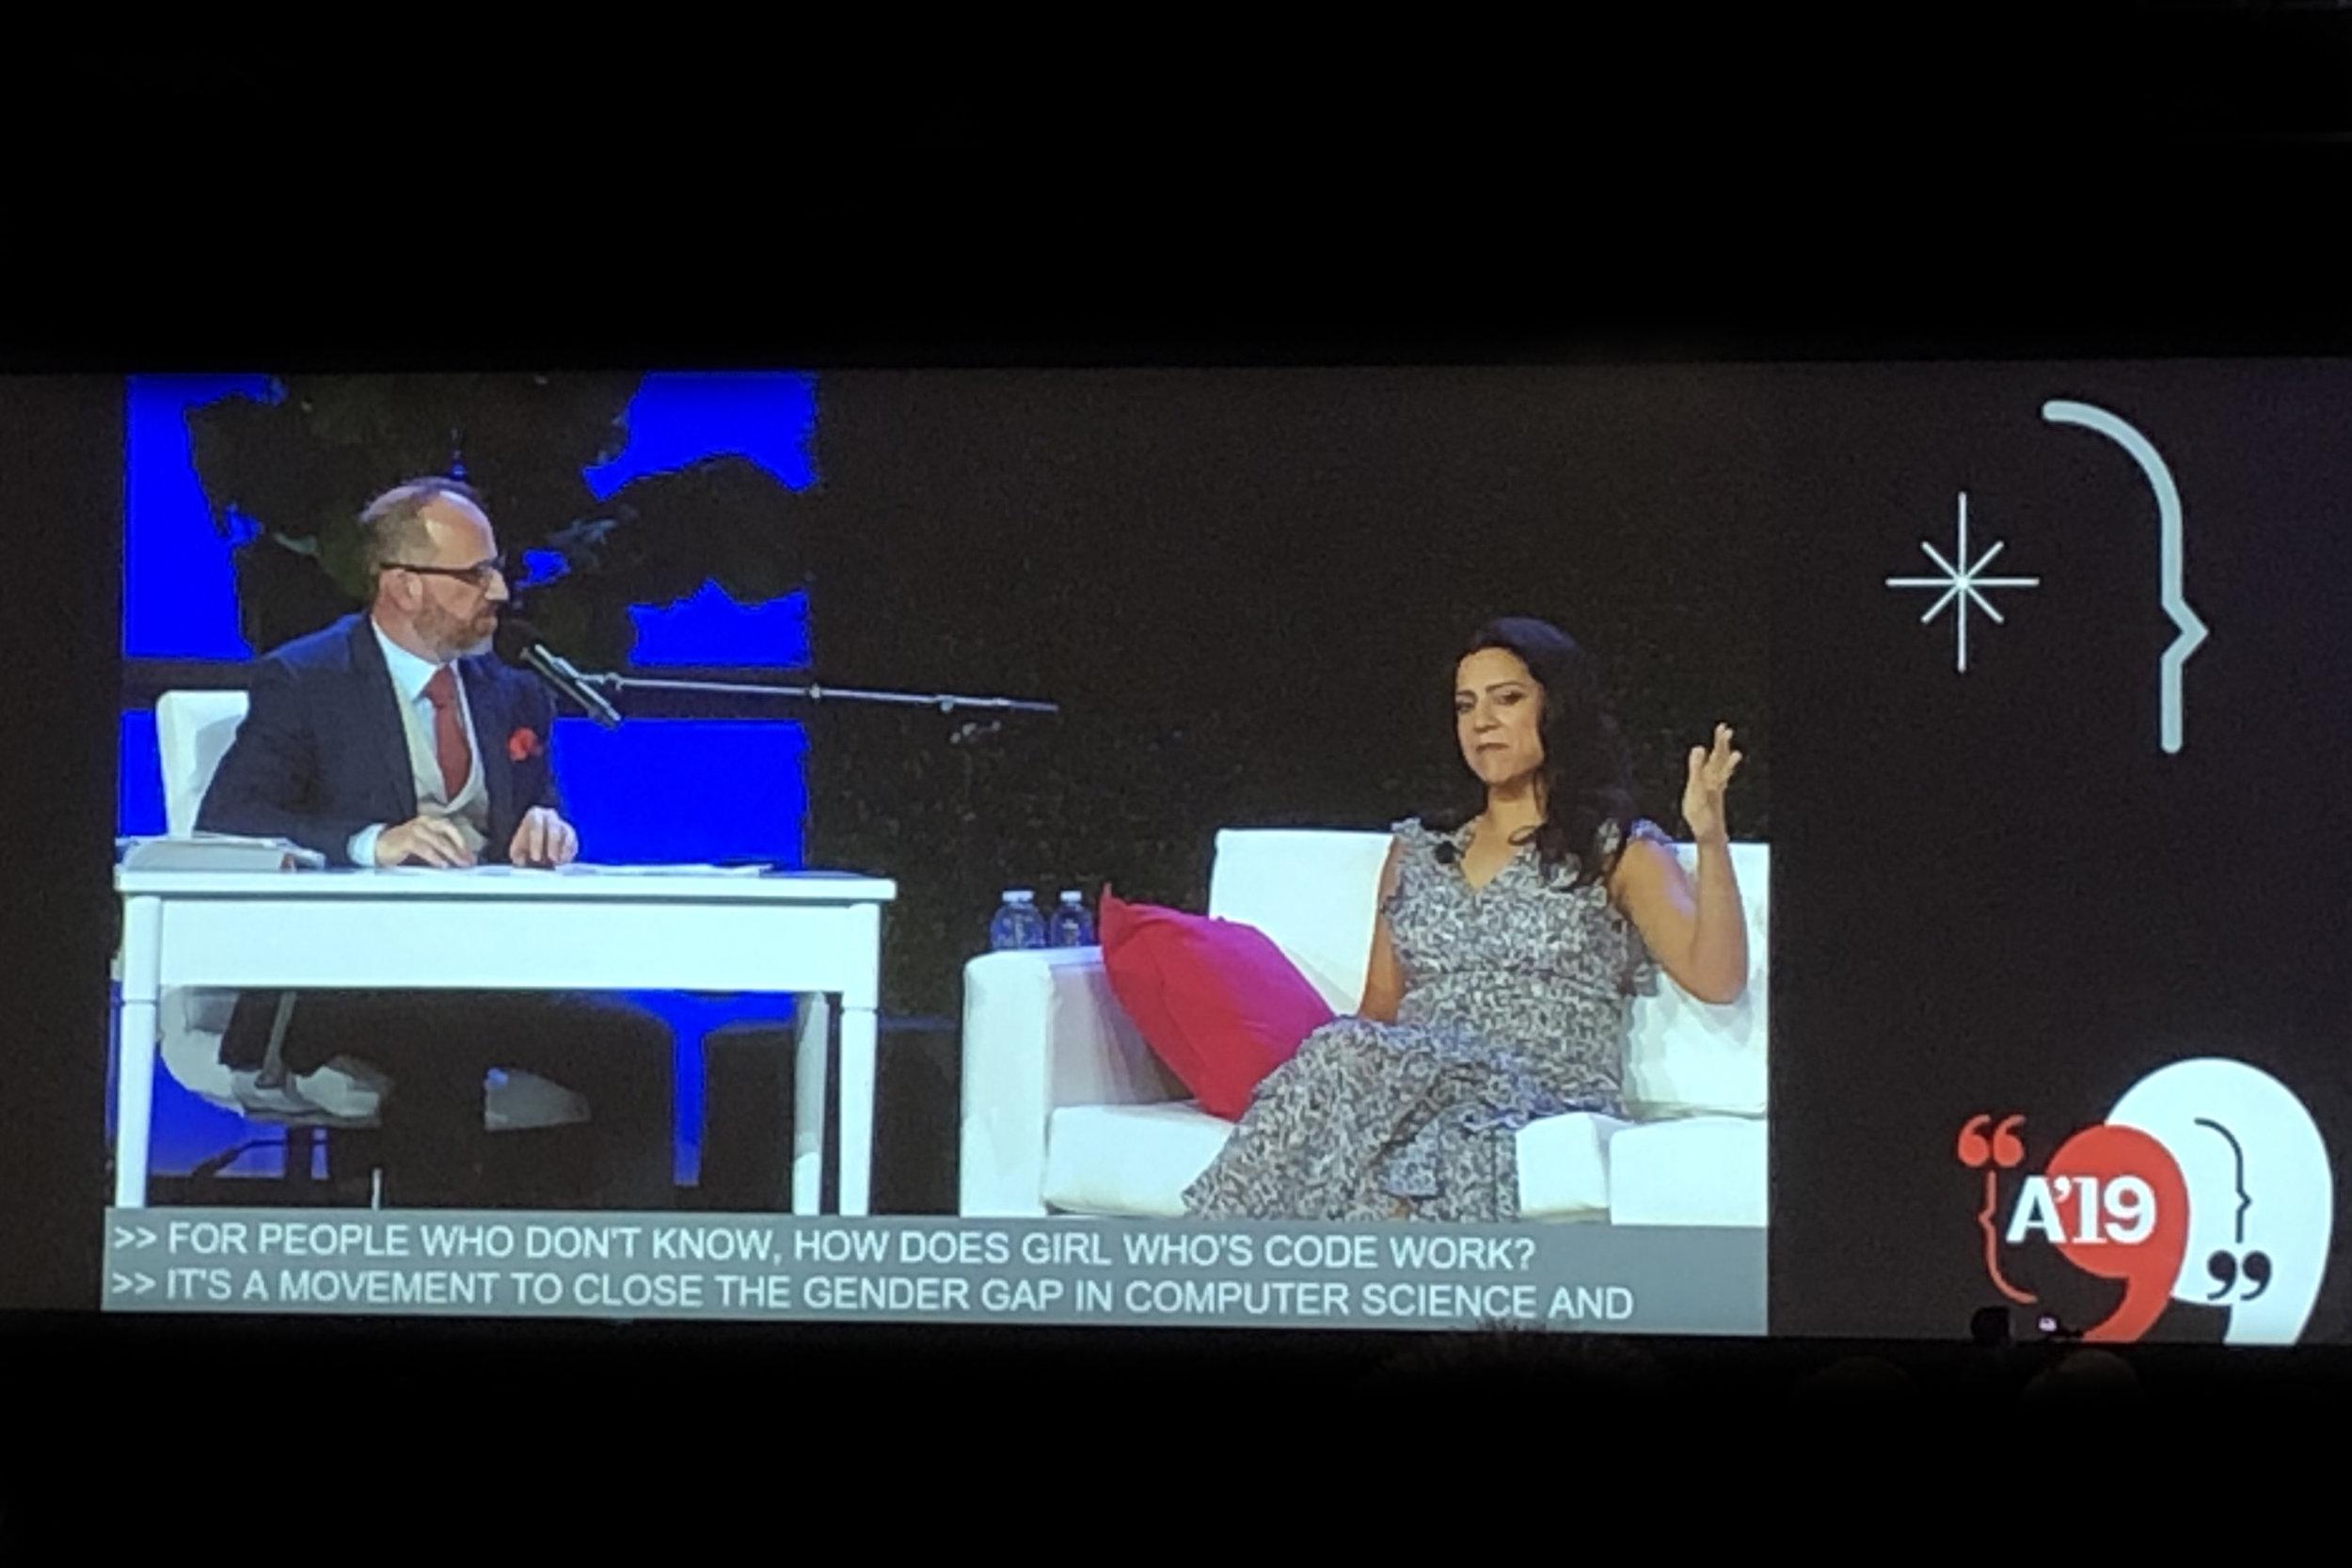 Roman Mars and Reshma Saujani at the AIA meeting.